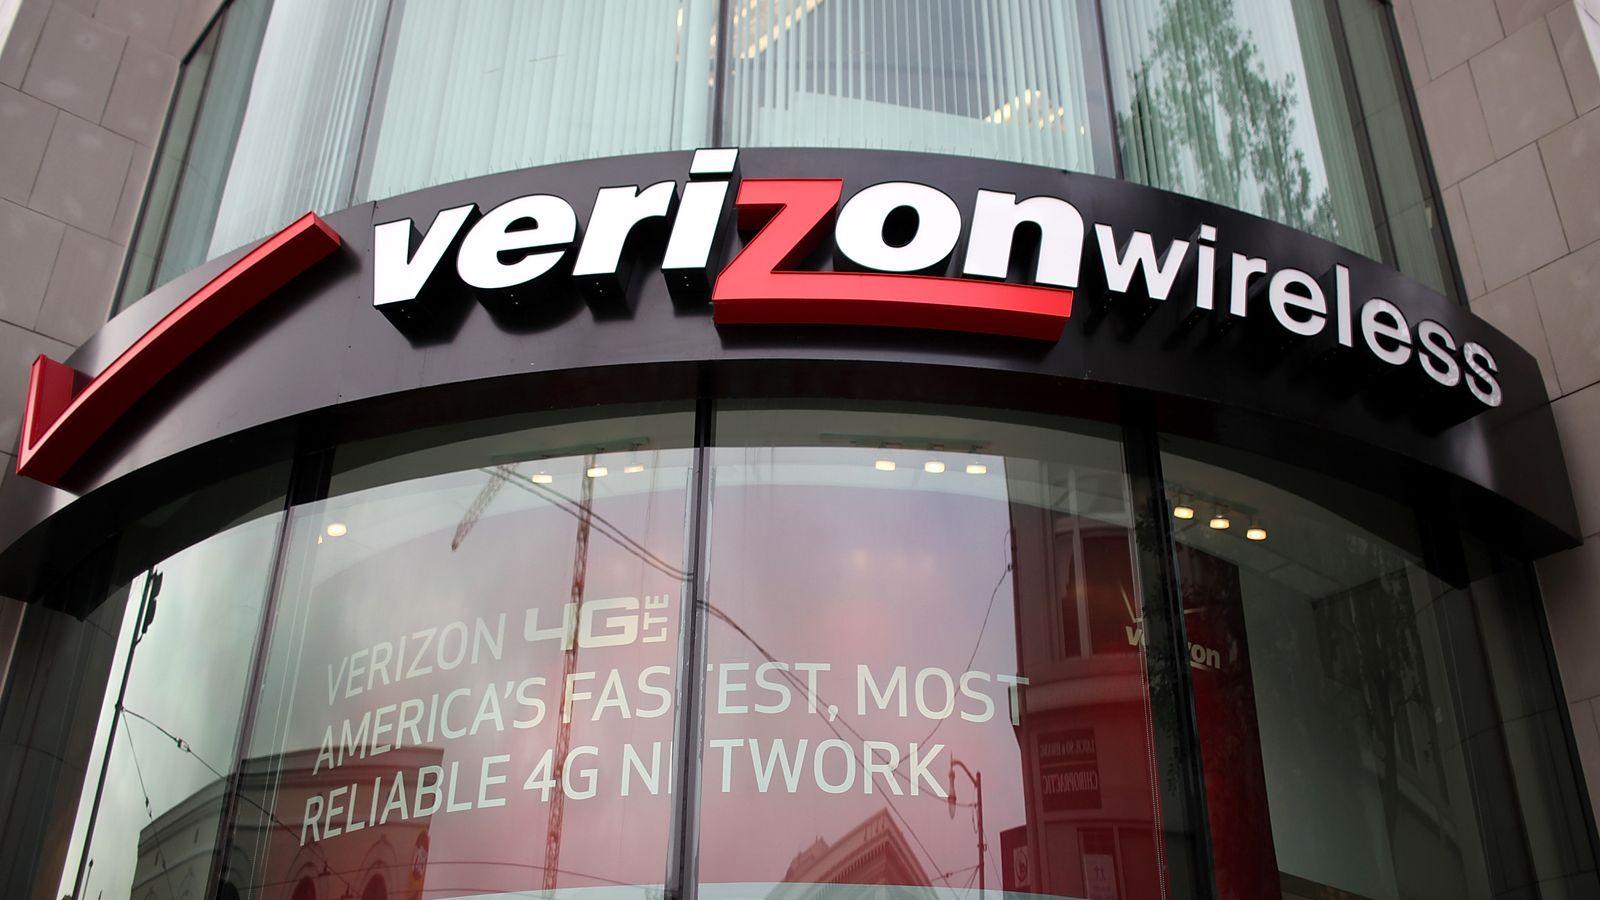 Verizon is doing away with contracts Verizon wireless